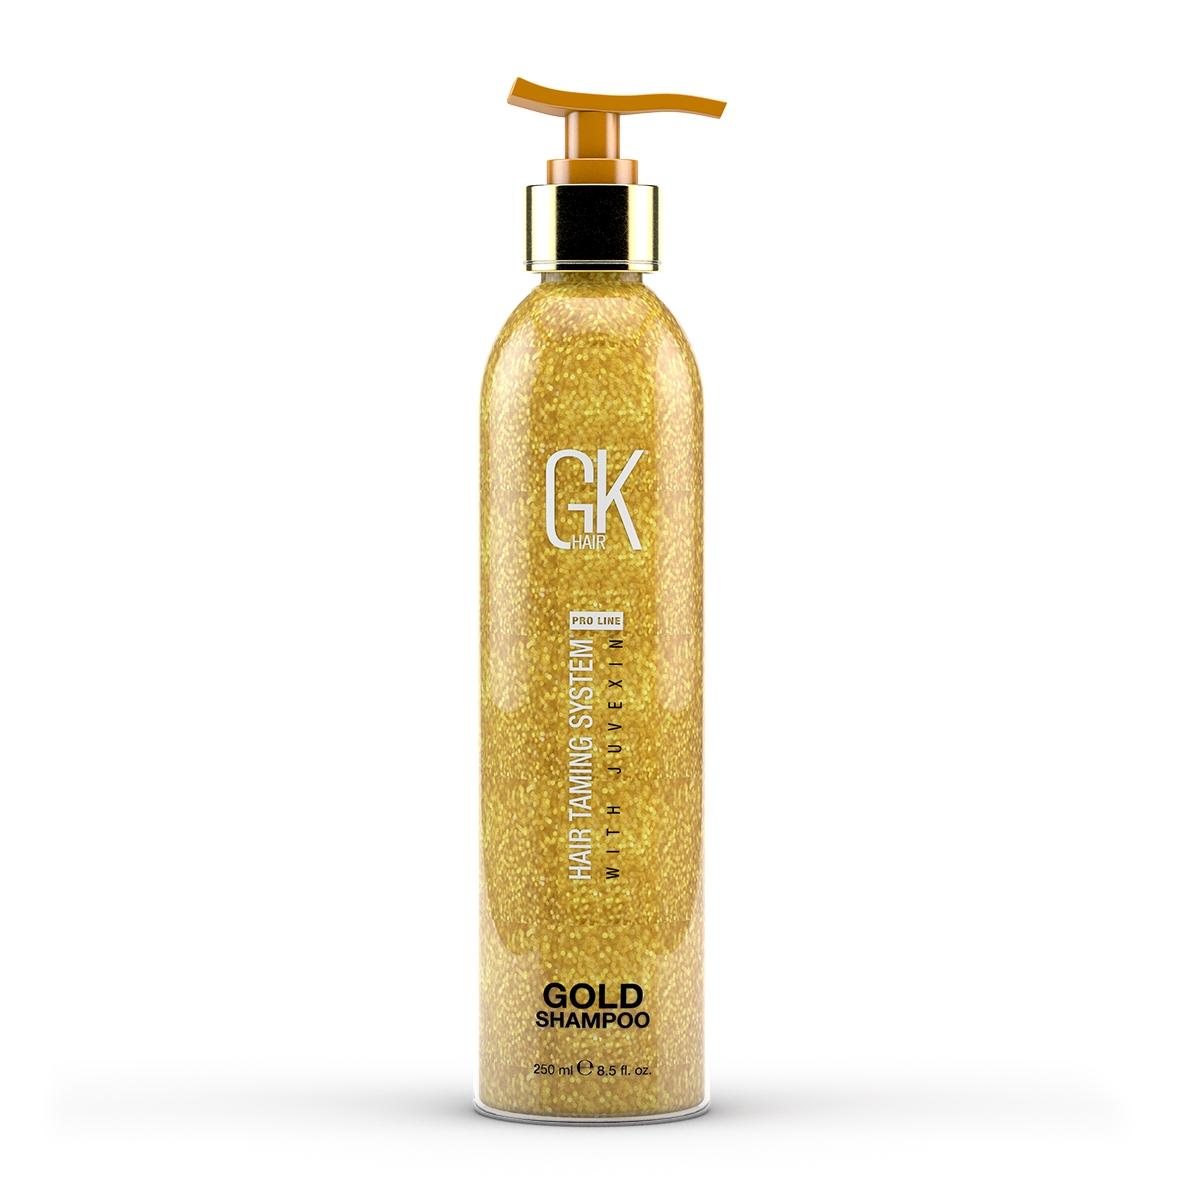 Global Keratin Золотой Шампунь Gold Shampoo, 250 мл